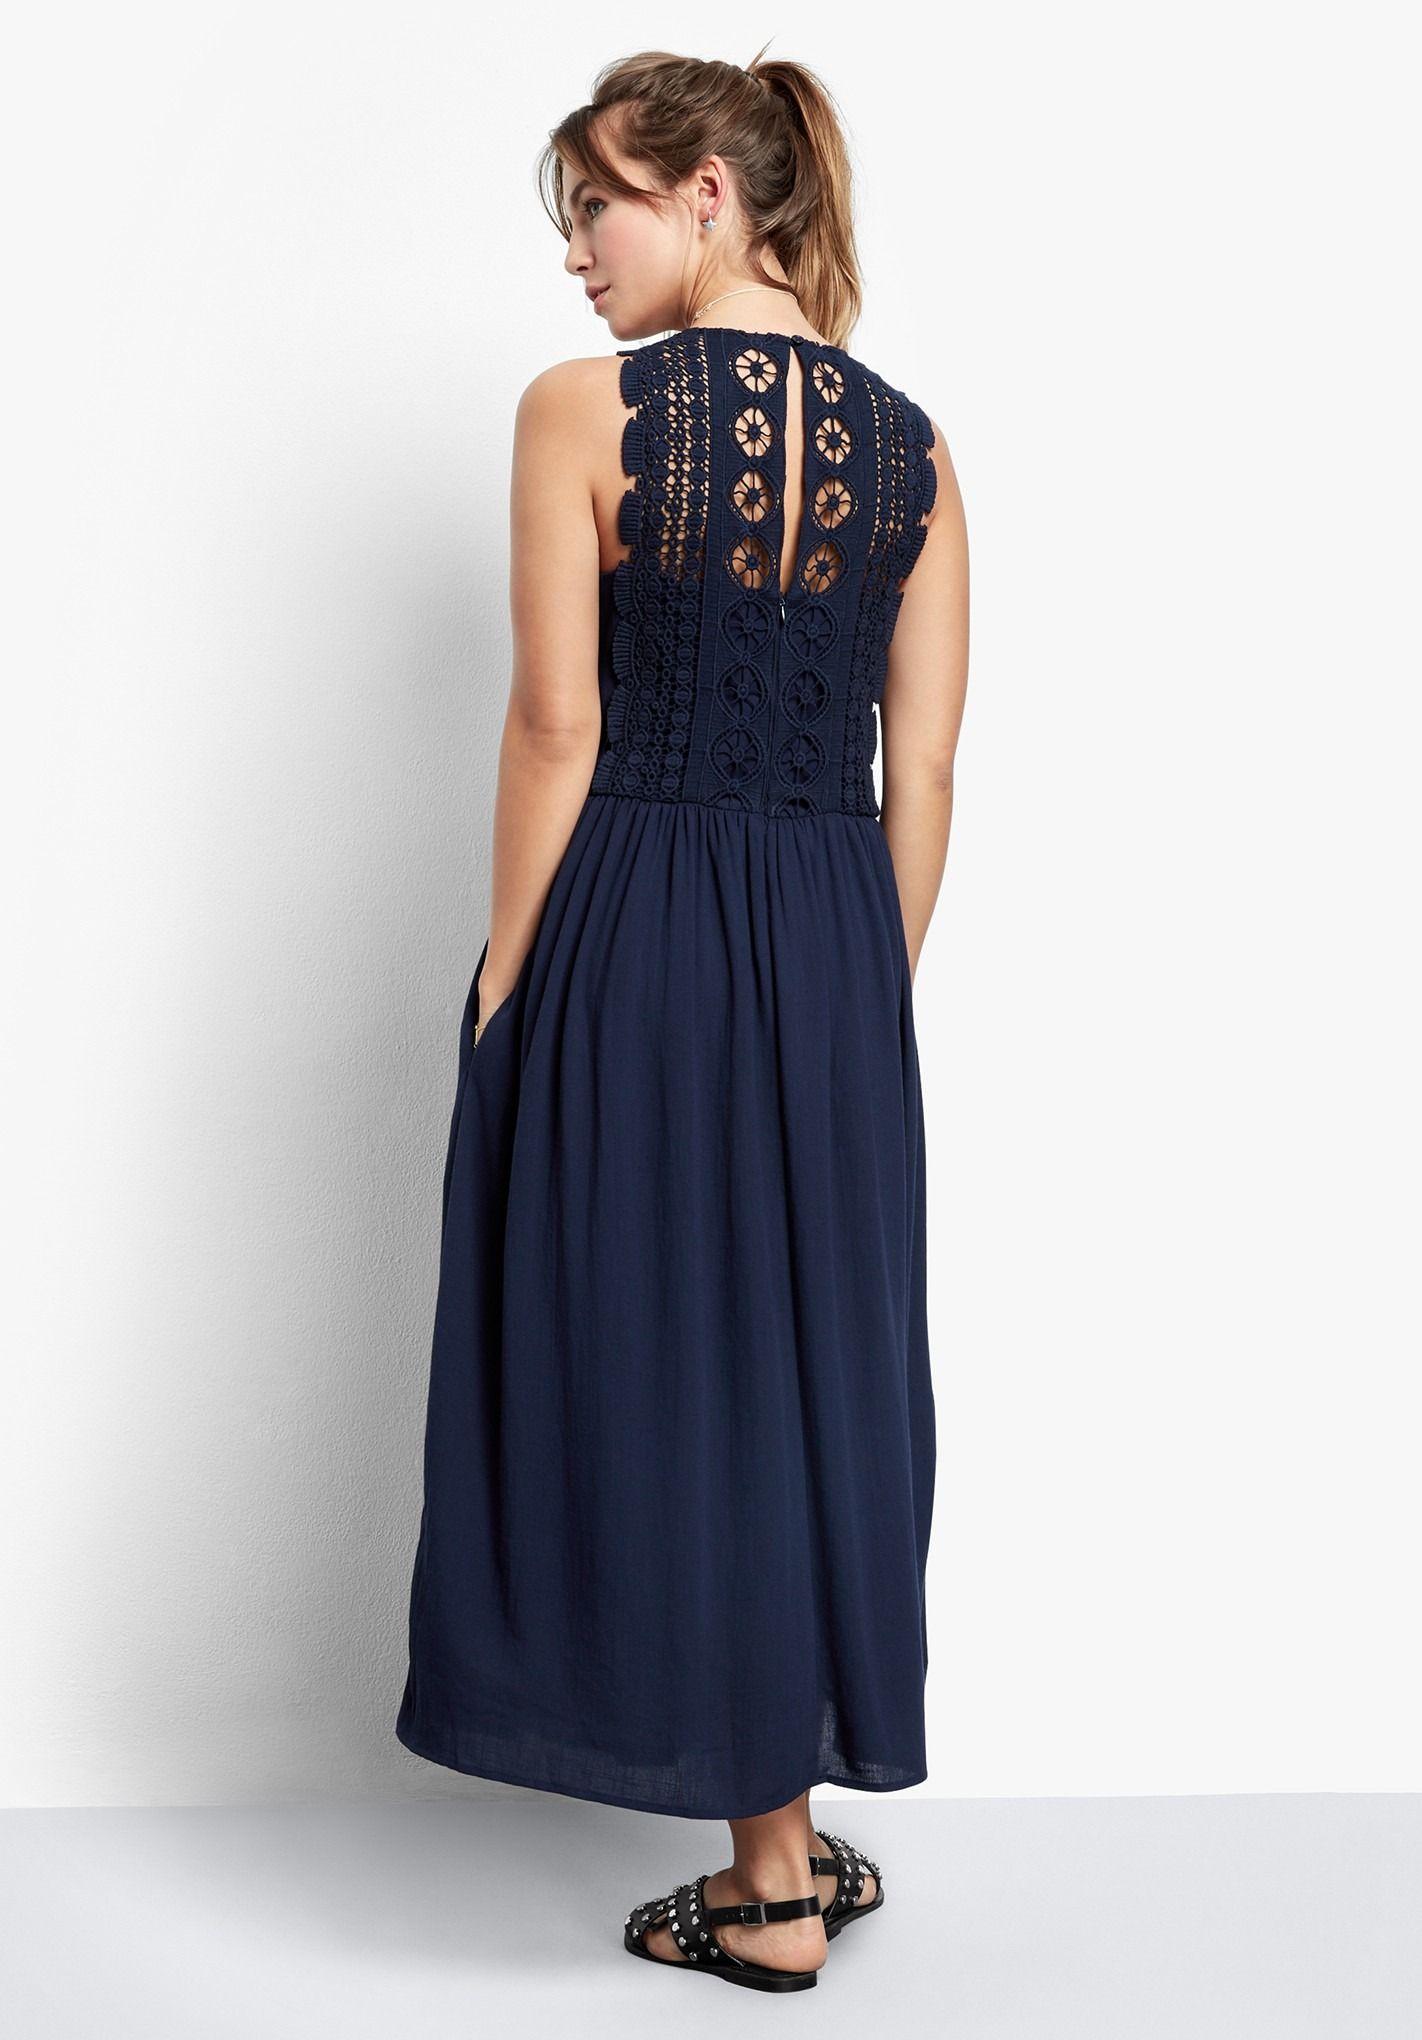 Windsor Dress By Hush Windsor Dresses Dresses Beautiful Dresses [ 2040 x 1422 Pixel ]